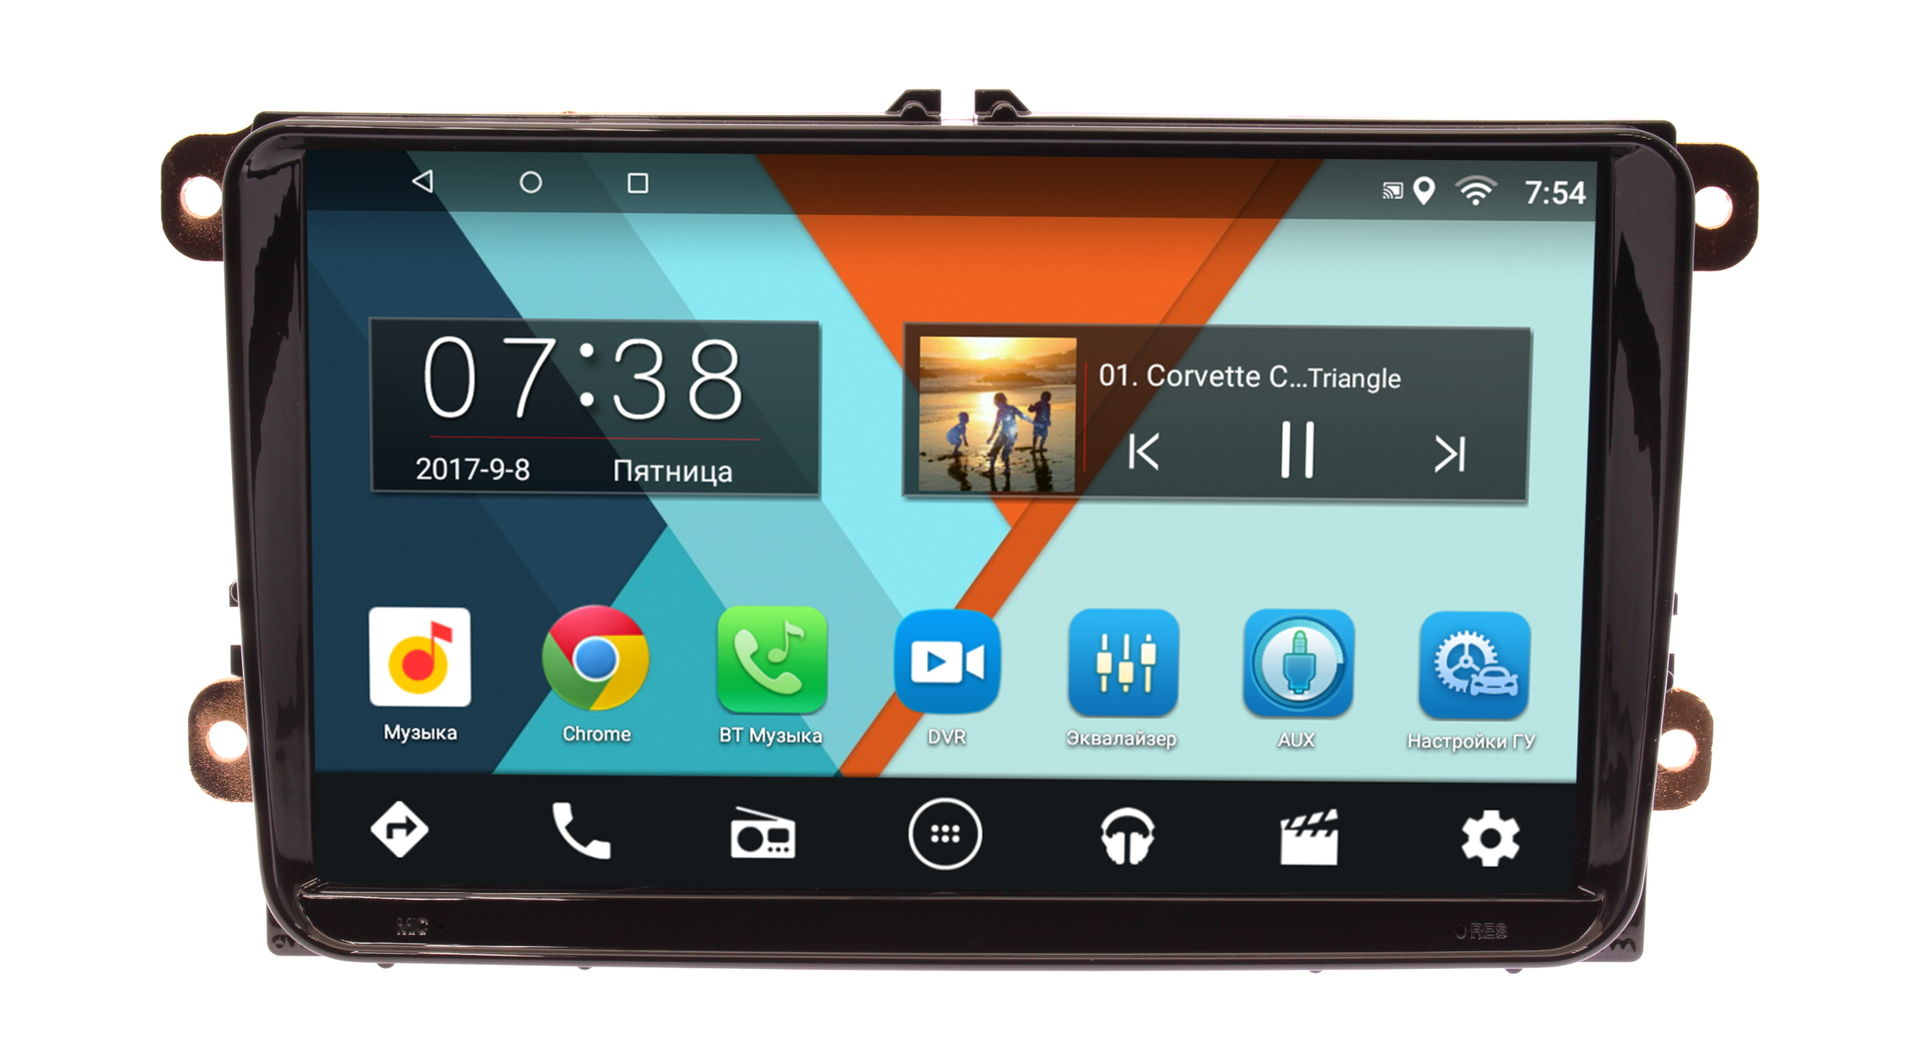 Штатная магнитола Volkswagen Amarok, Jetta, Golf, Passat, Polo, Scirocco, Tiguan, Touran Wide Media MT9001 на Android 7.1.1 (2/16)